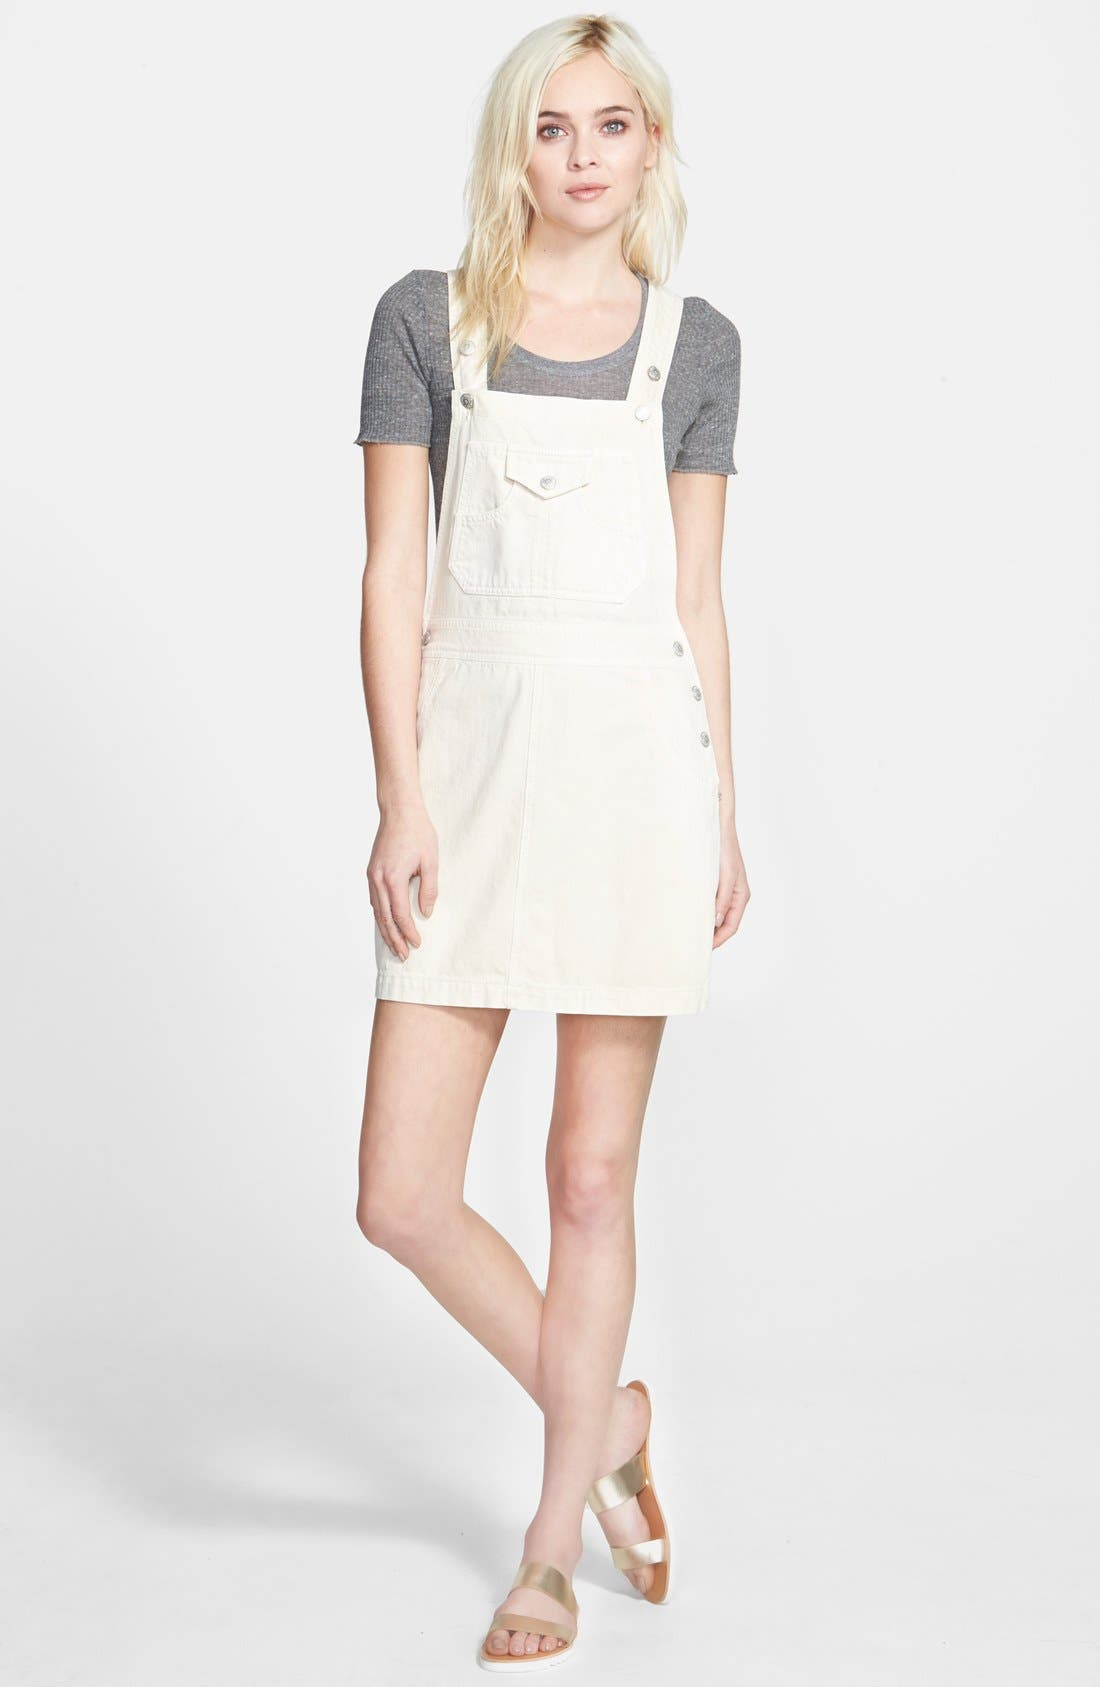 Alexa Chung for AG 'The Gillian' Overalls Dress,                             Main thumbnail 1, color,                             100